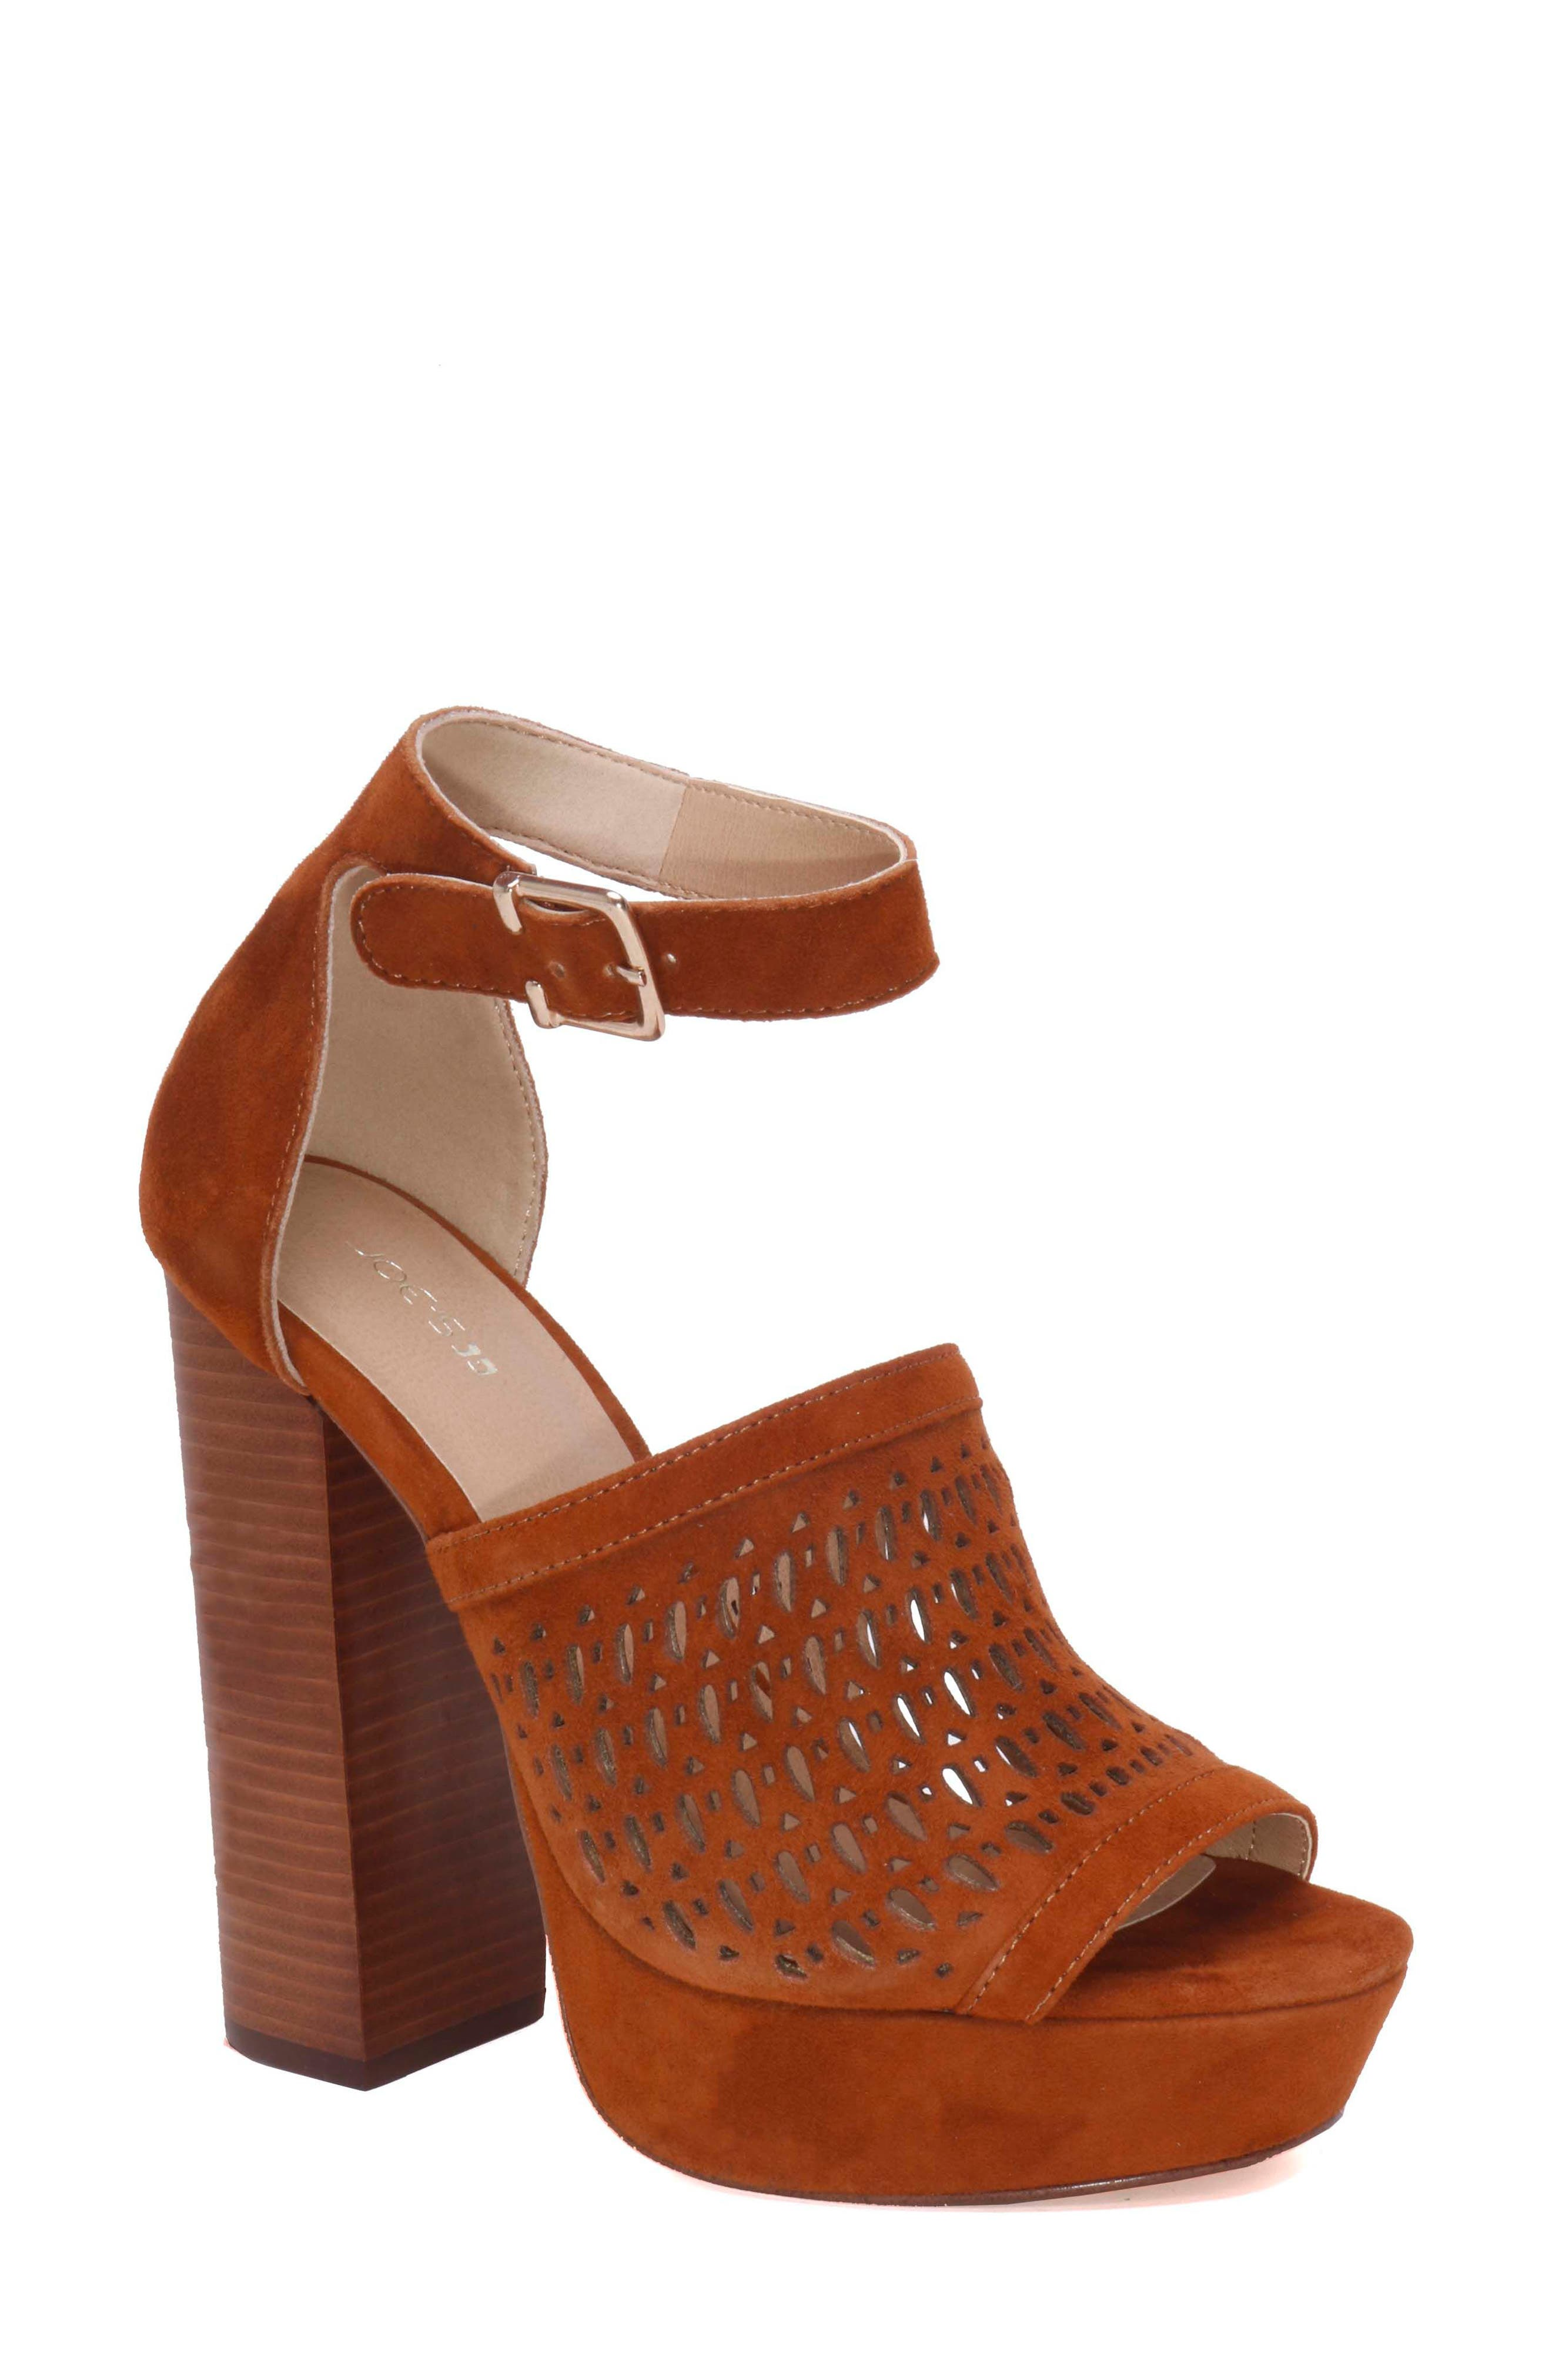 Lorne Platform Sandal,                             Main thumbnail 1, color,                             200